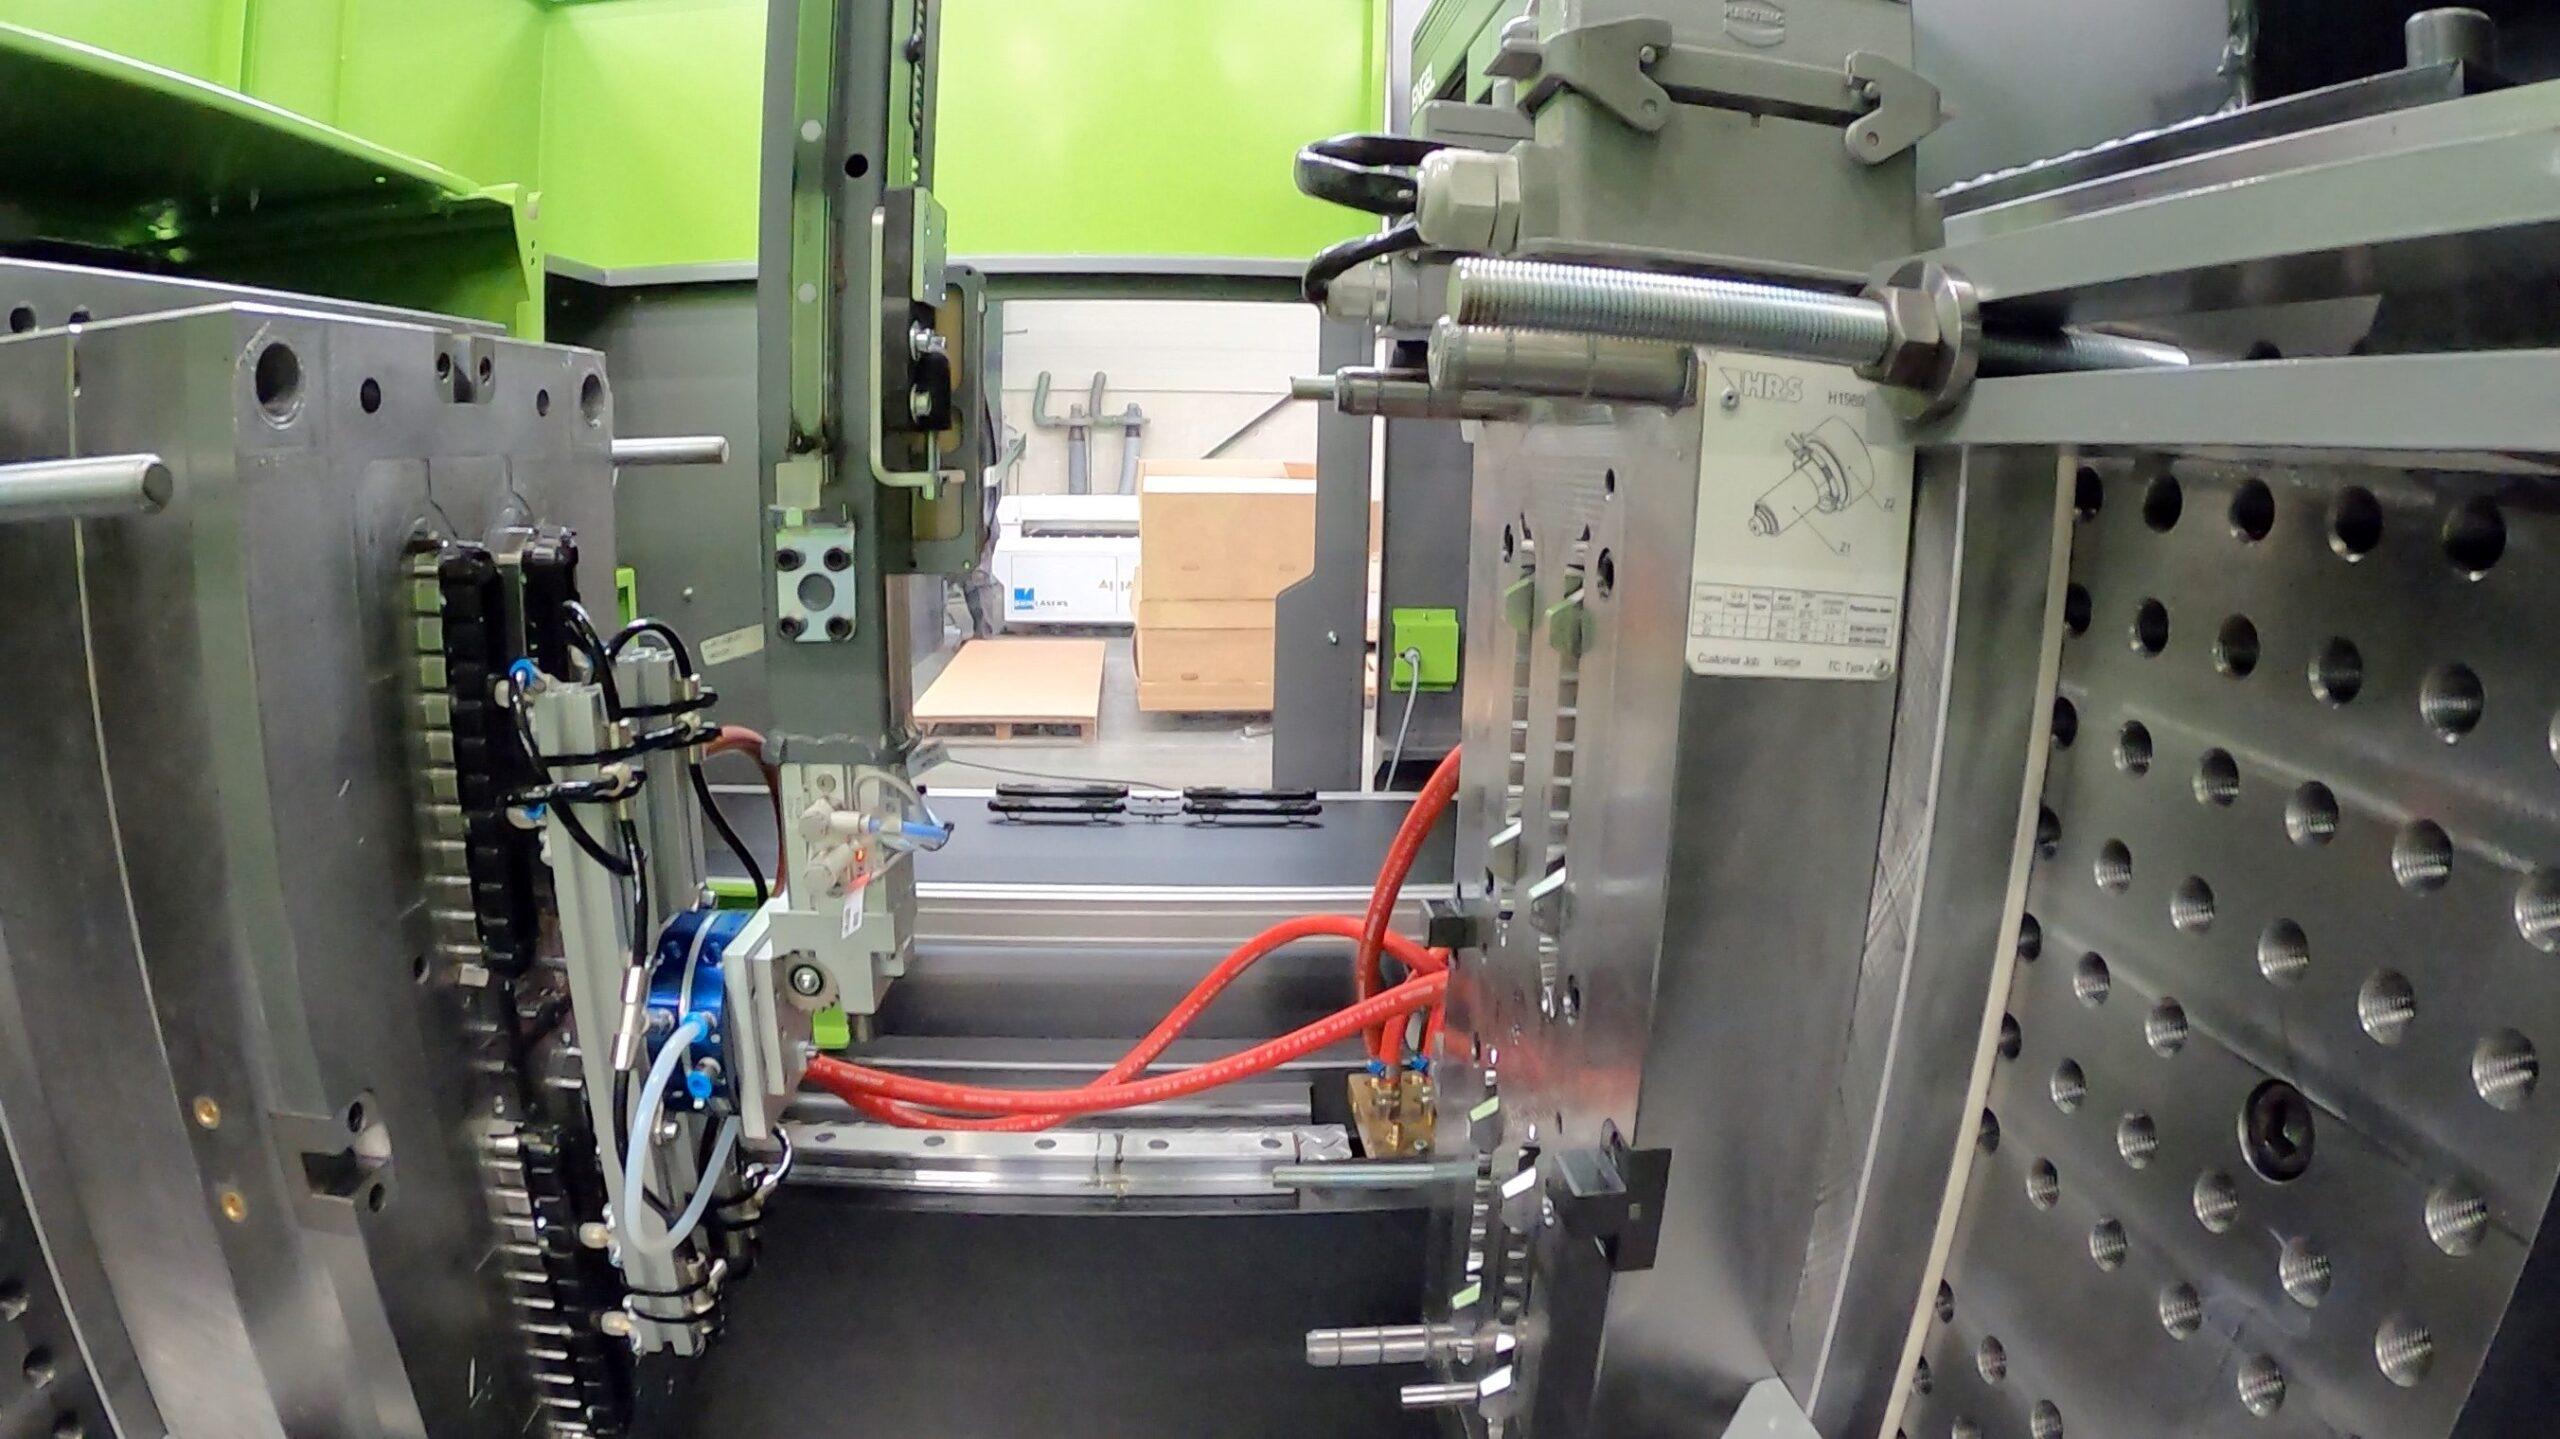 New Engel machine